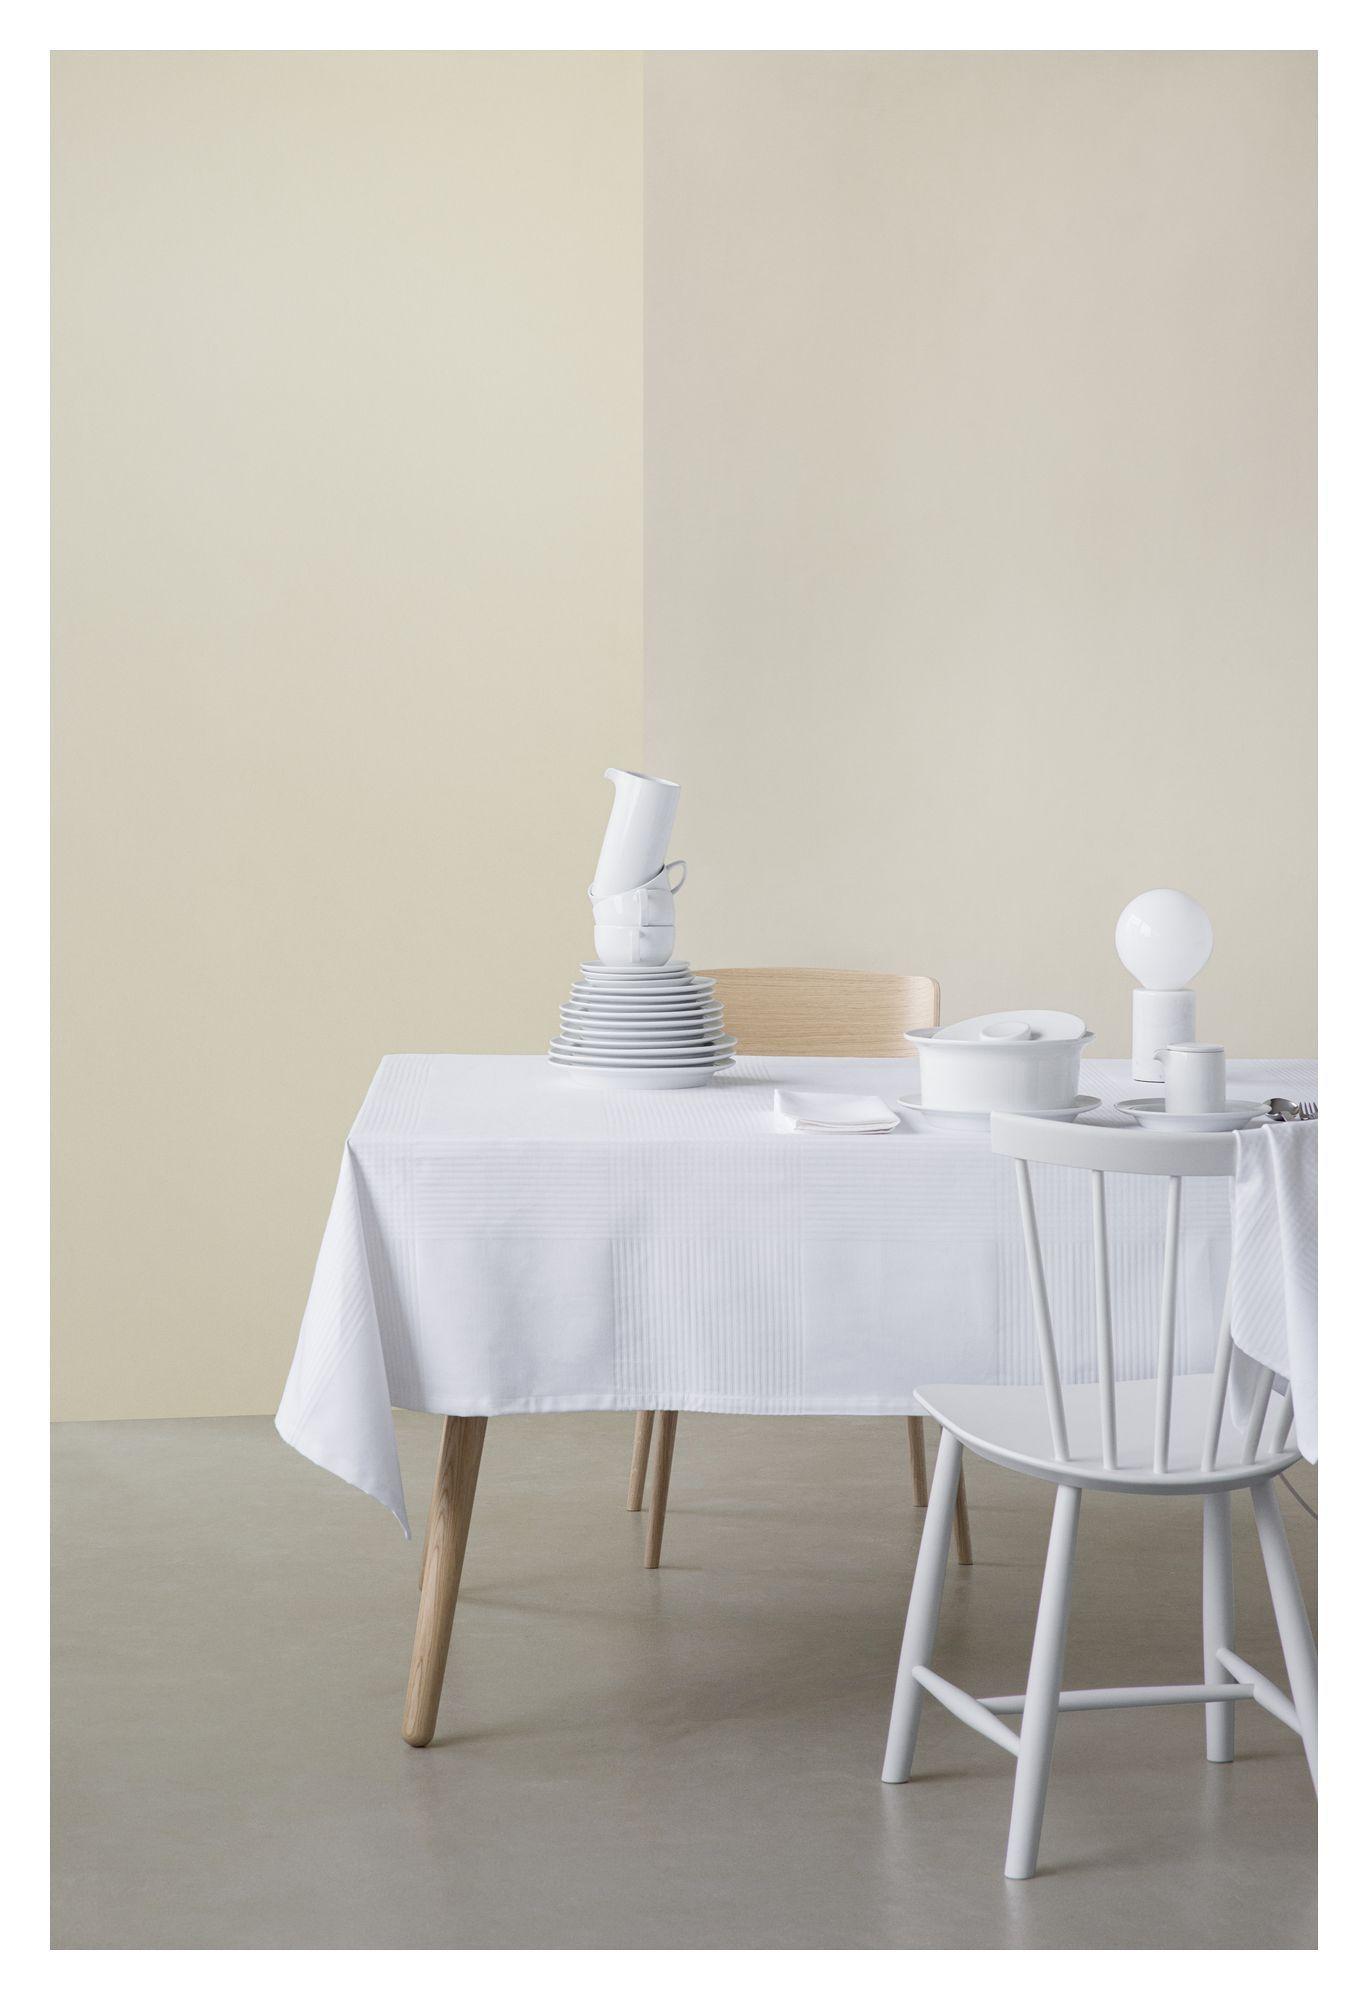 FDB Møbler - Olga Dug 290x140 - Hvid